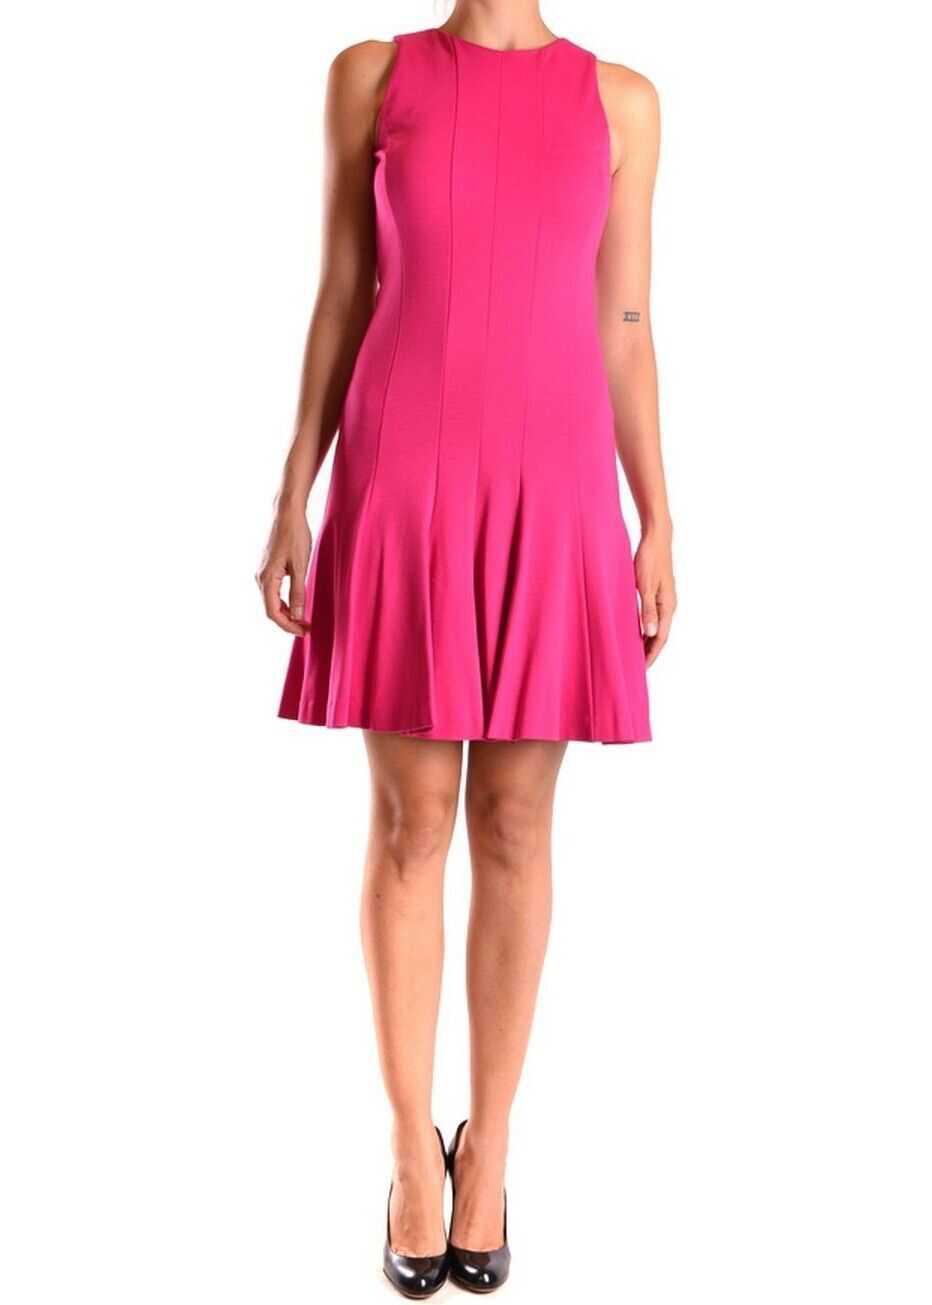 Michael Kors Viscose Dress PINK